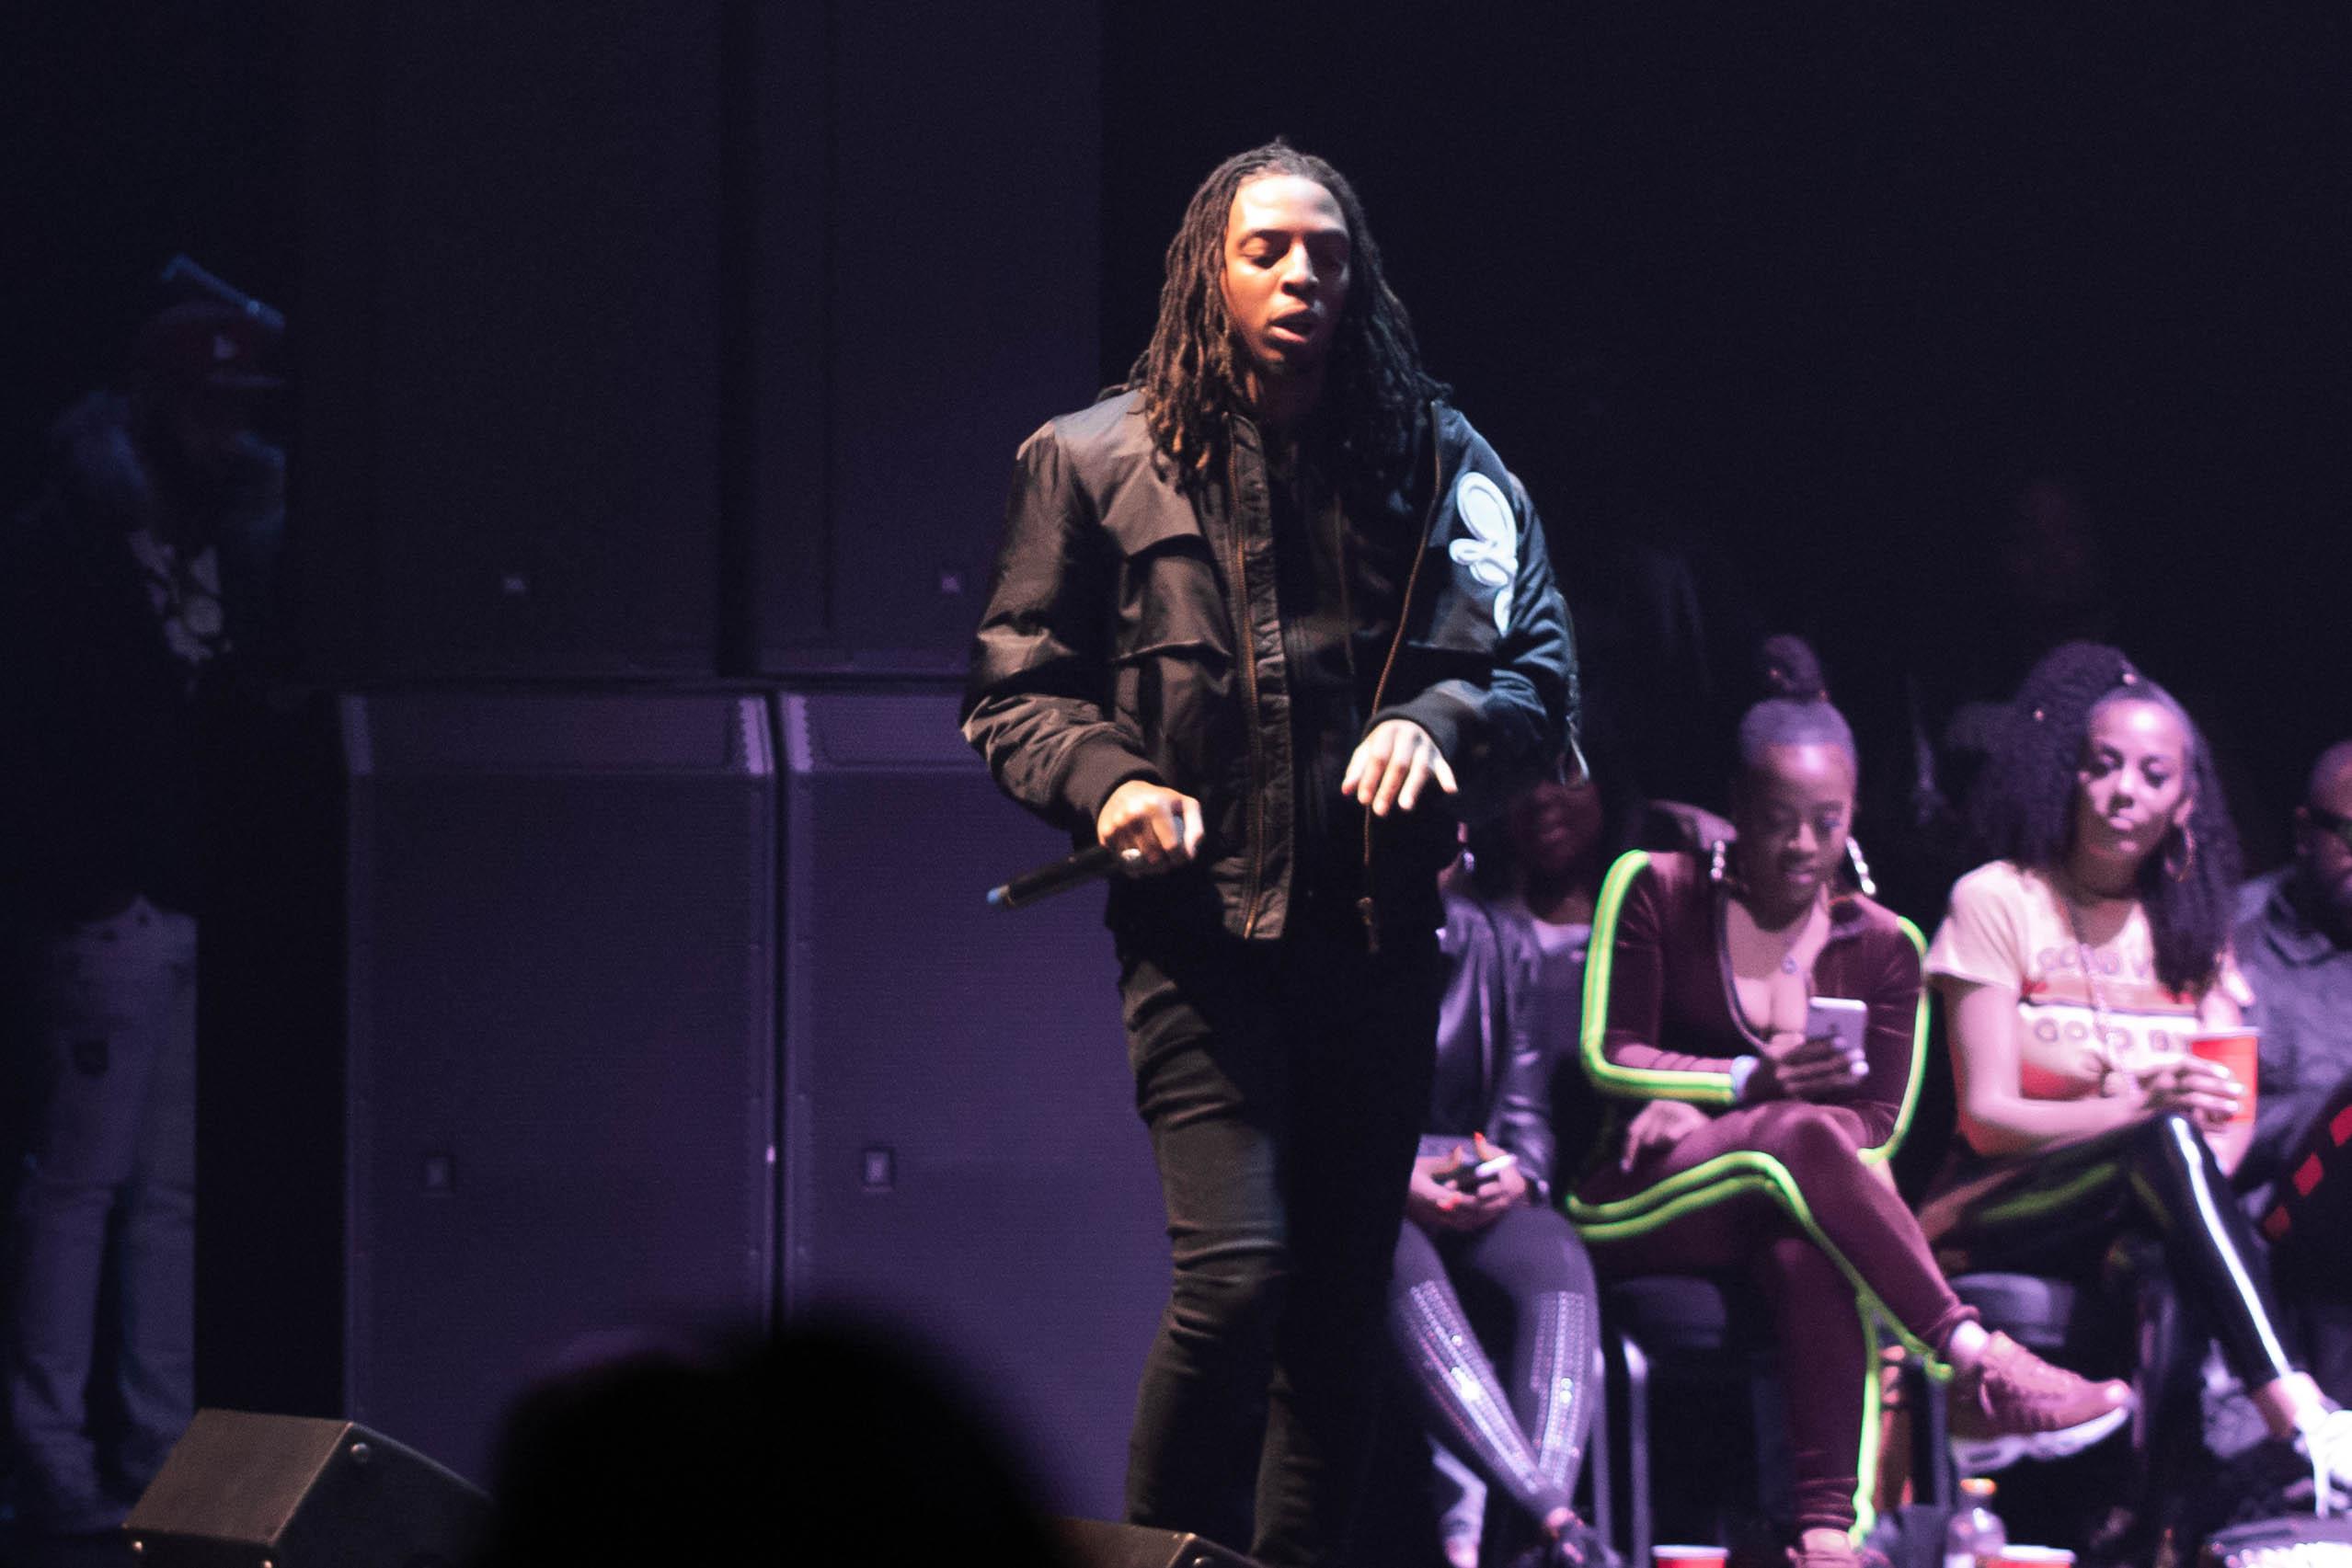 Rockstar Rodie. The Chicago Theatre. Dec 28, 2018. Photo by- Kevin Baker @ImKevinBaker. Chicago, Il